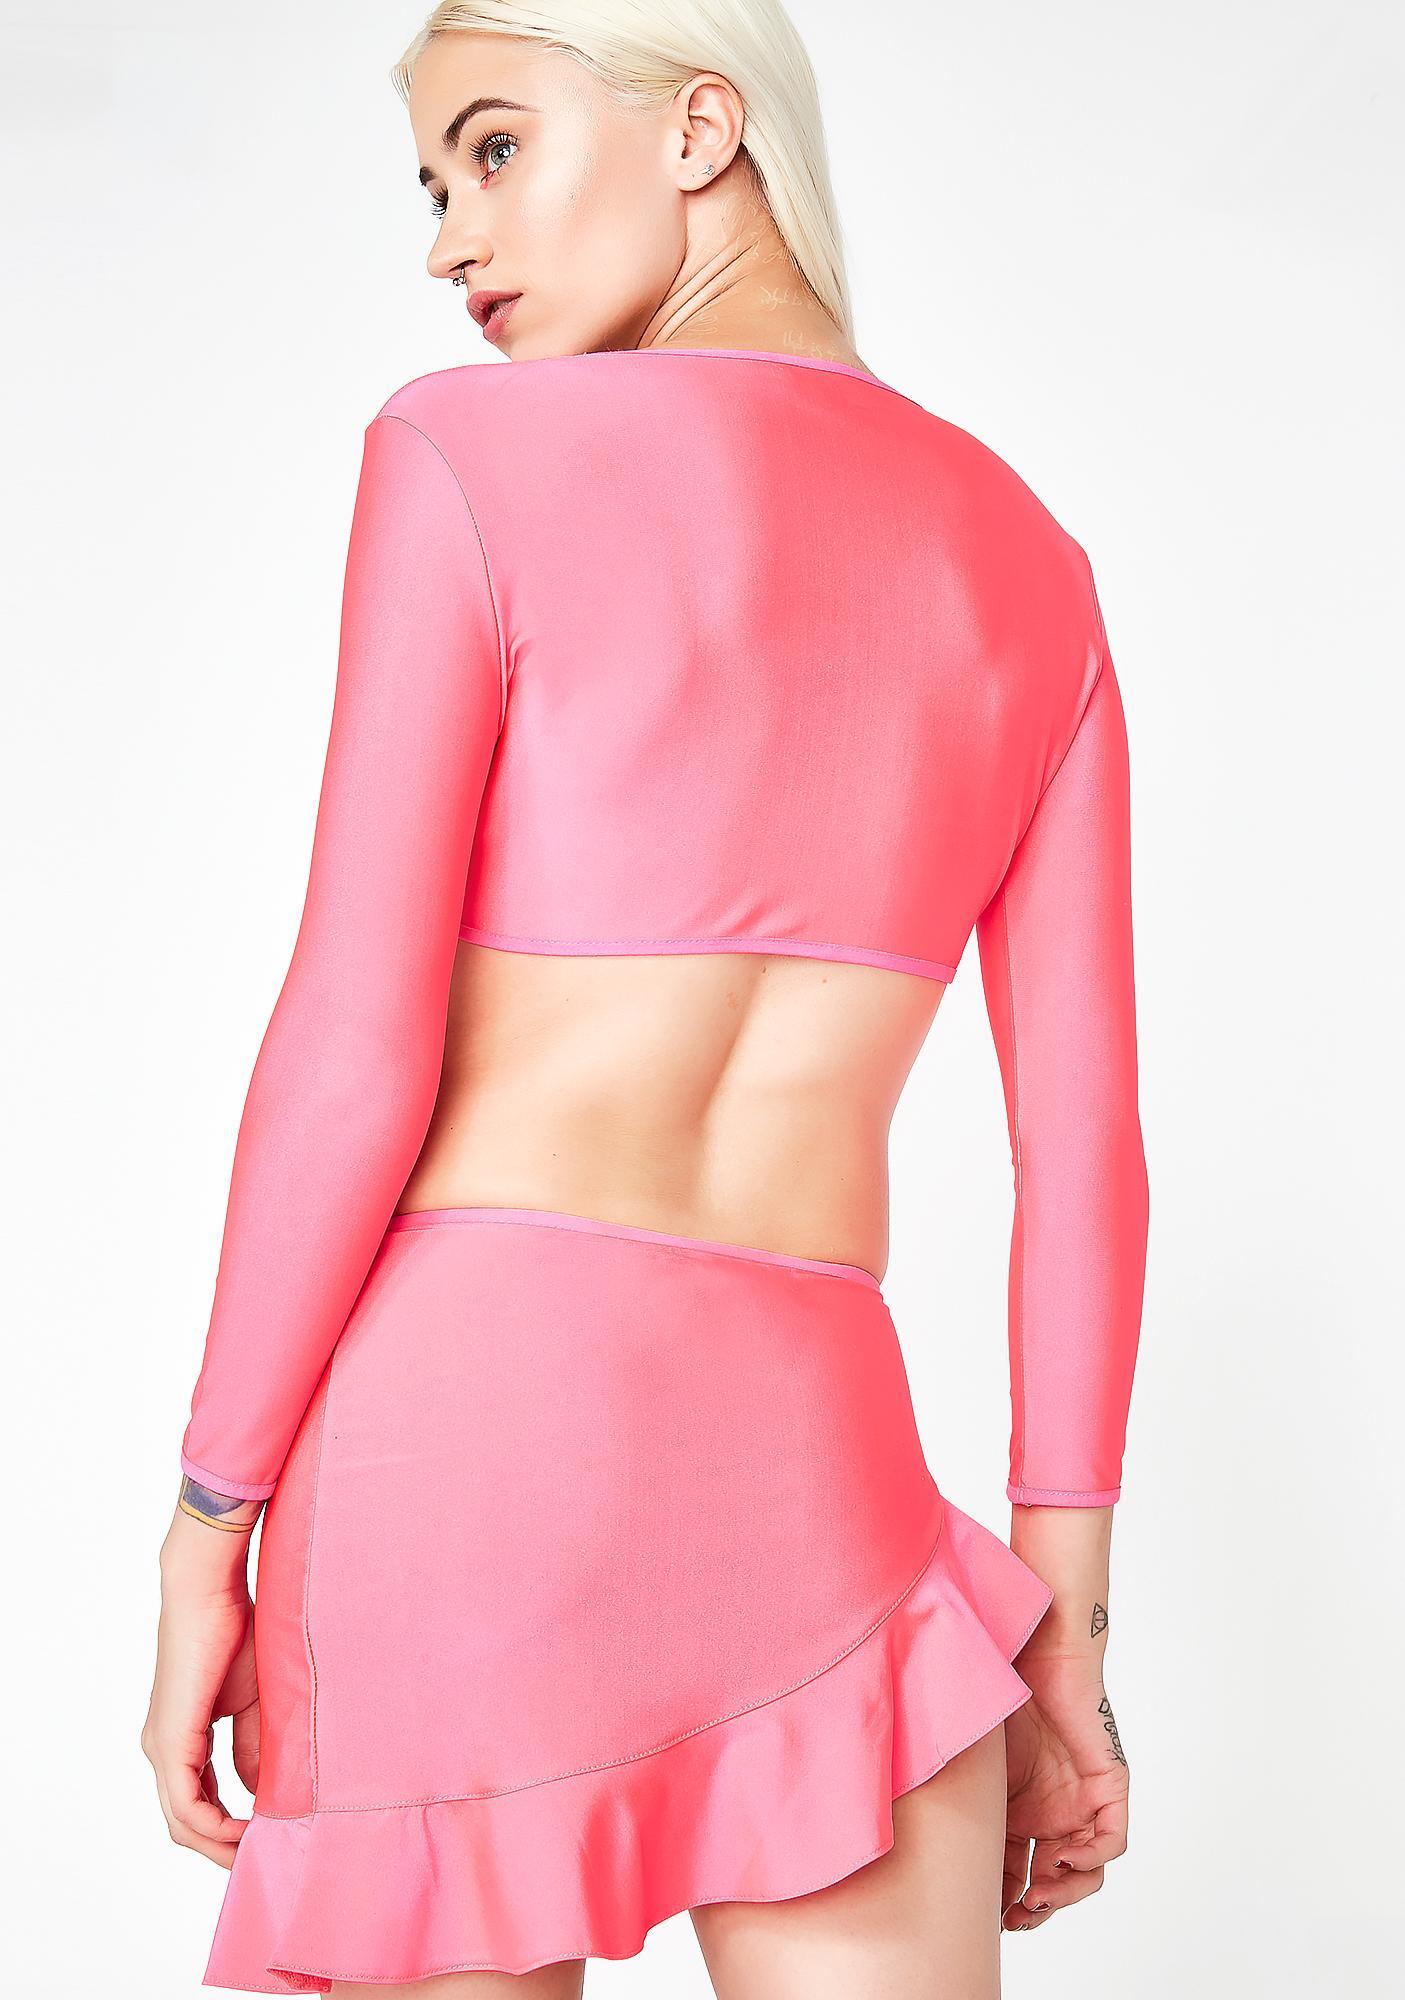 Club Exx Candy Toxxic Tease Mini Skirt